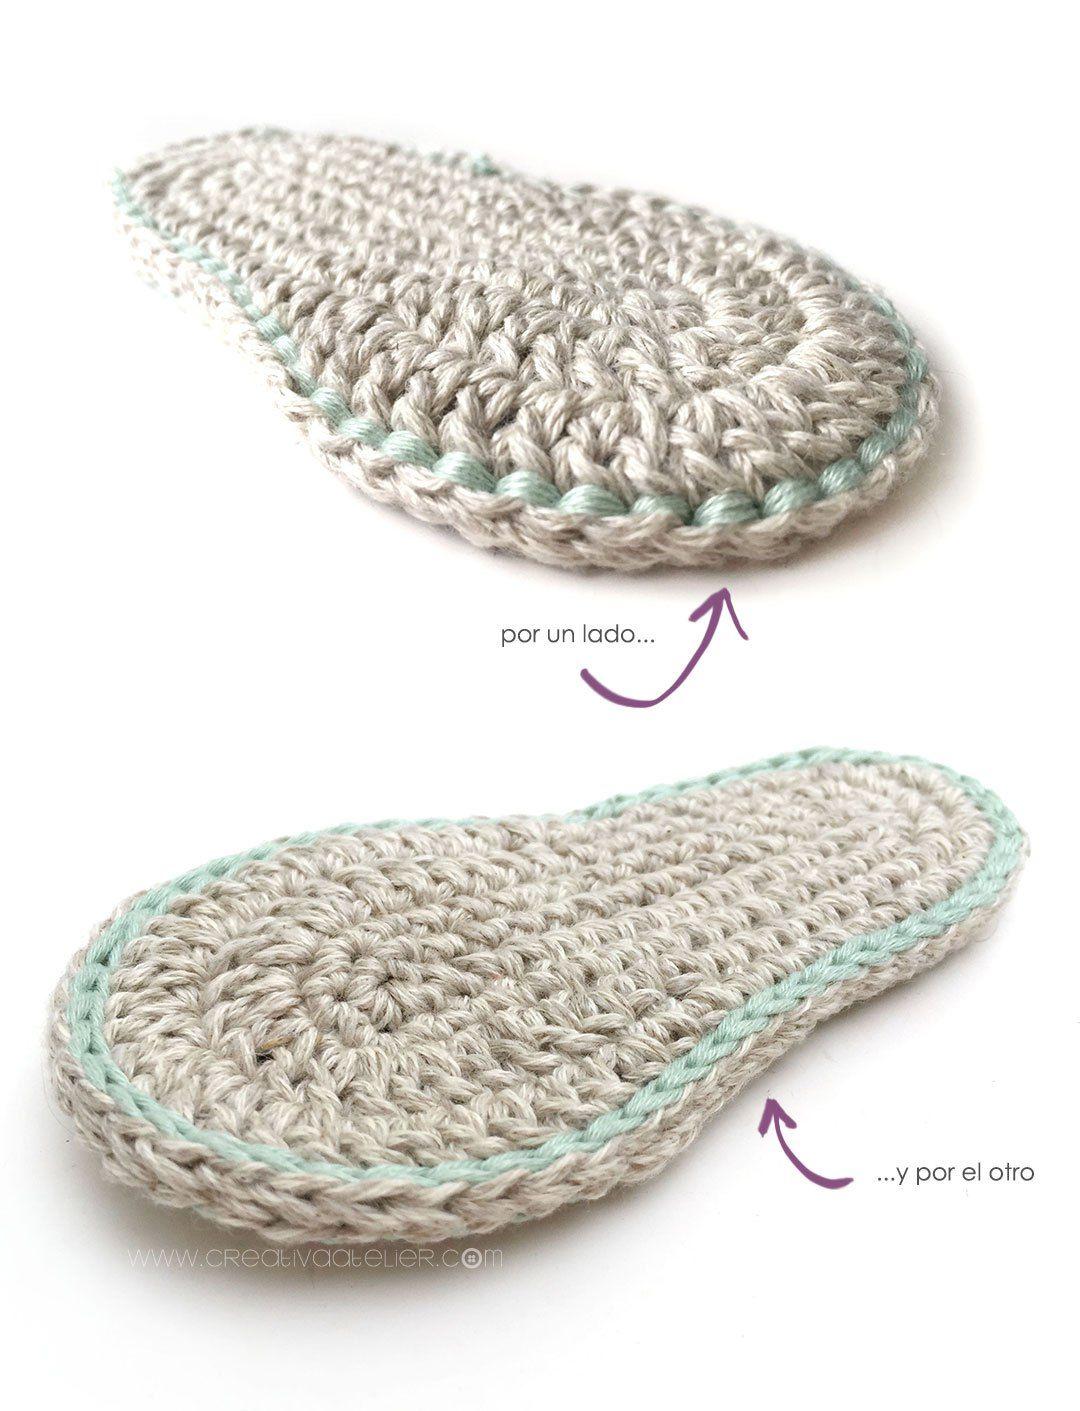 Excelente Crochet Sandalias De Bebé Patrón Libre Friso - Manta de ...